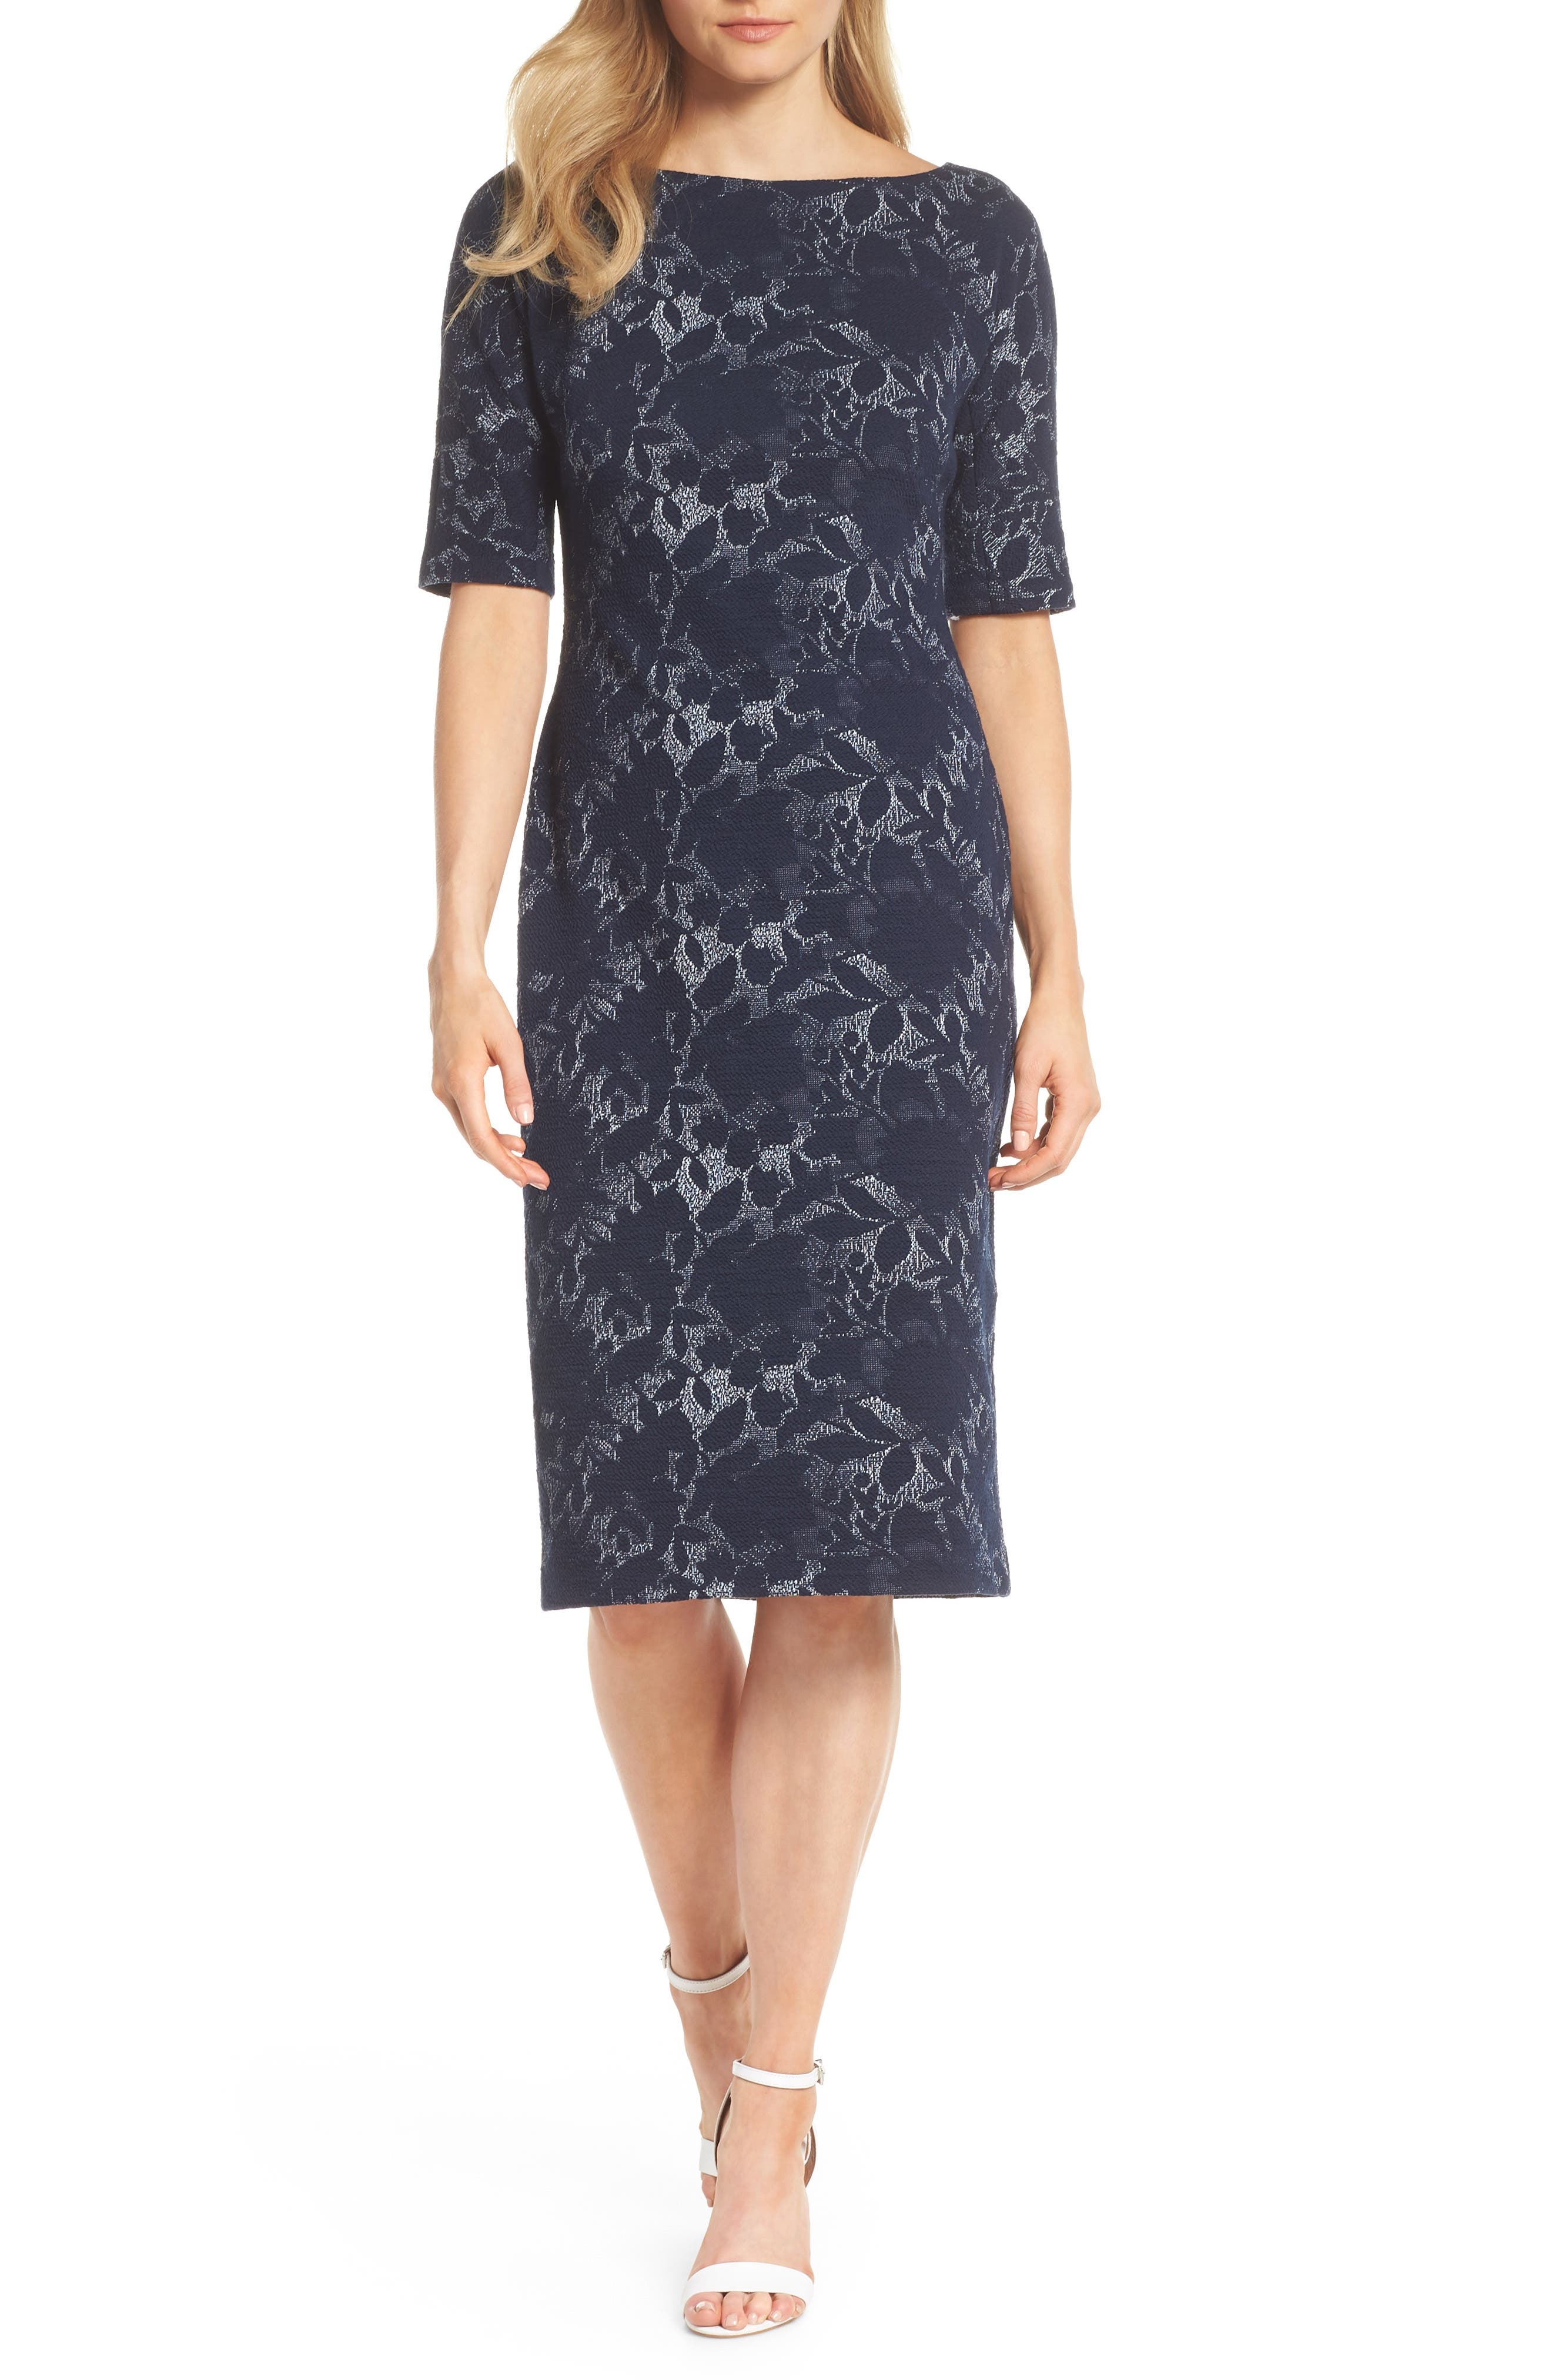 MAGGY LONDON Jacquard Pencil Dress, Main, color, 462